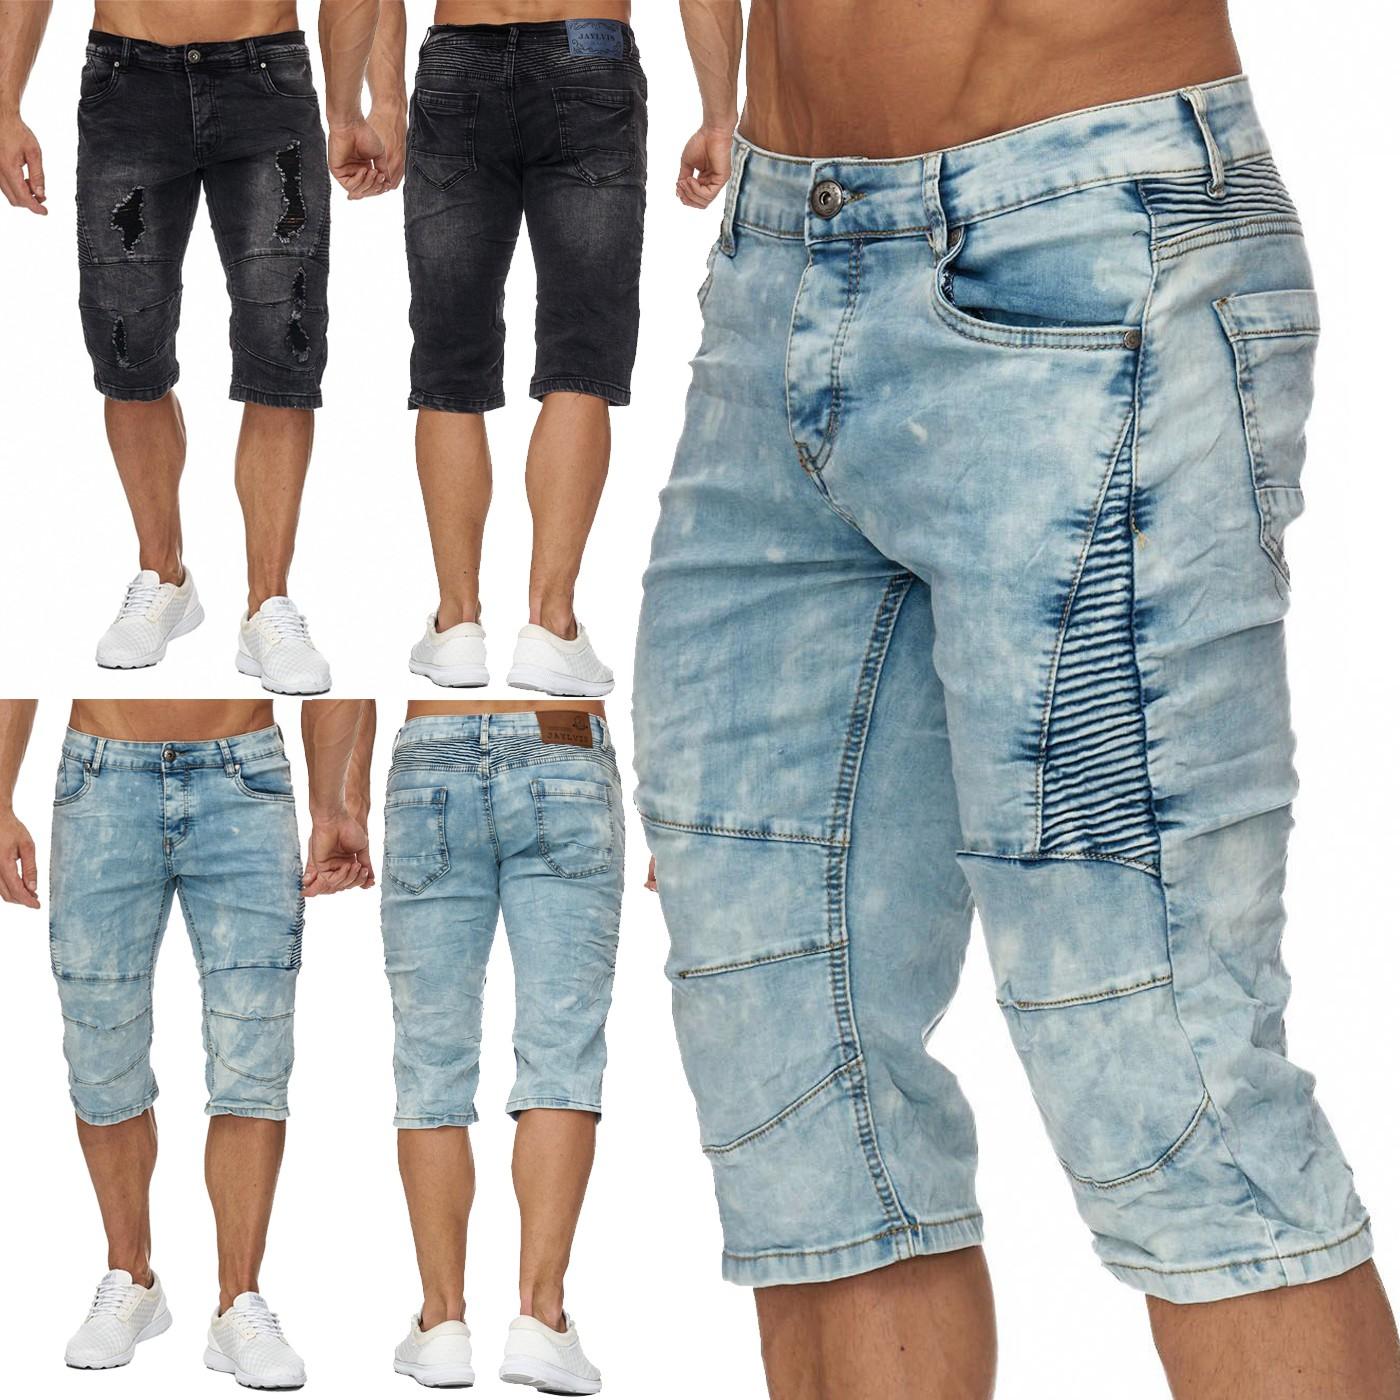 herren jeans shorts hose stonewashed denim biker 2 farben styles bermuda wow ebay. Black Bedroom Furniture Sets. Home Design Ideas